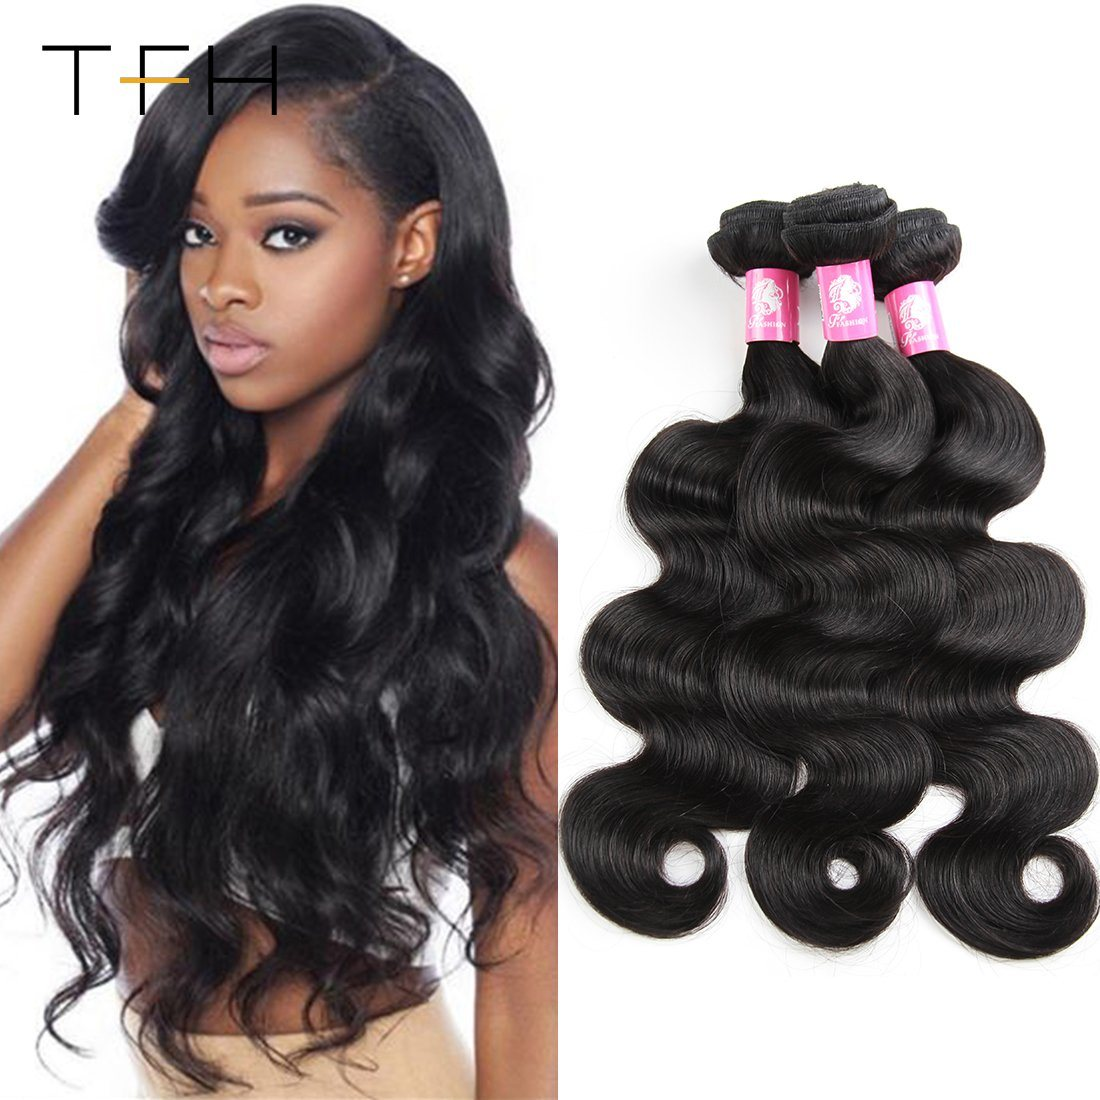 China Top Quality 9a Brazilian Virgin Hair Weave Wholesale 100